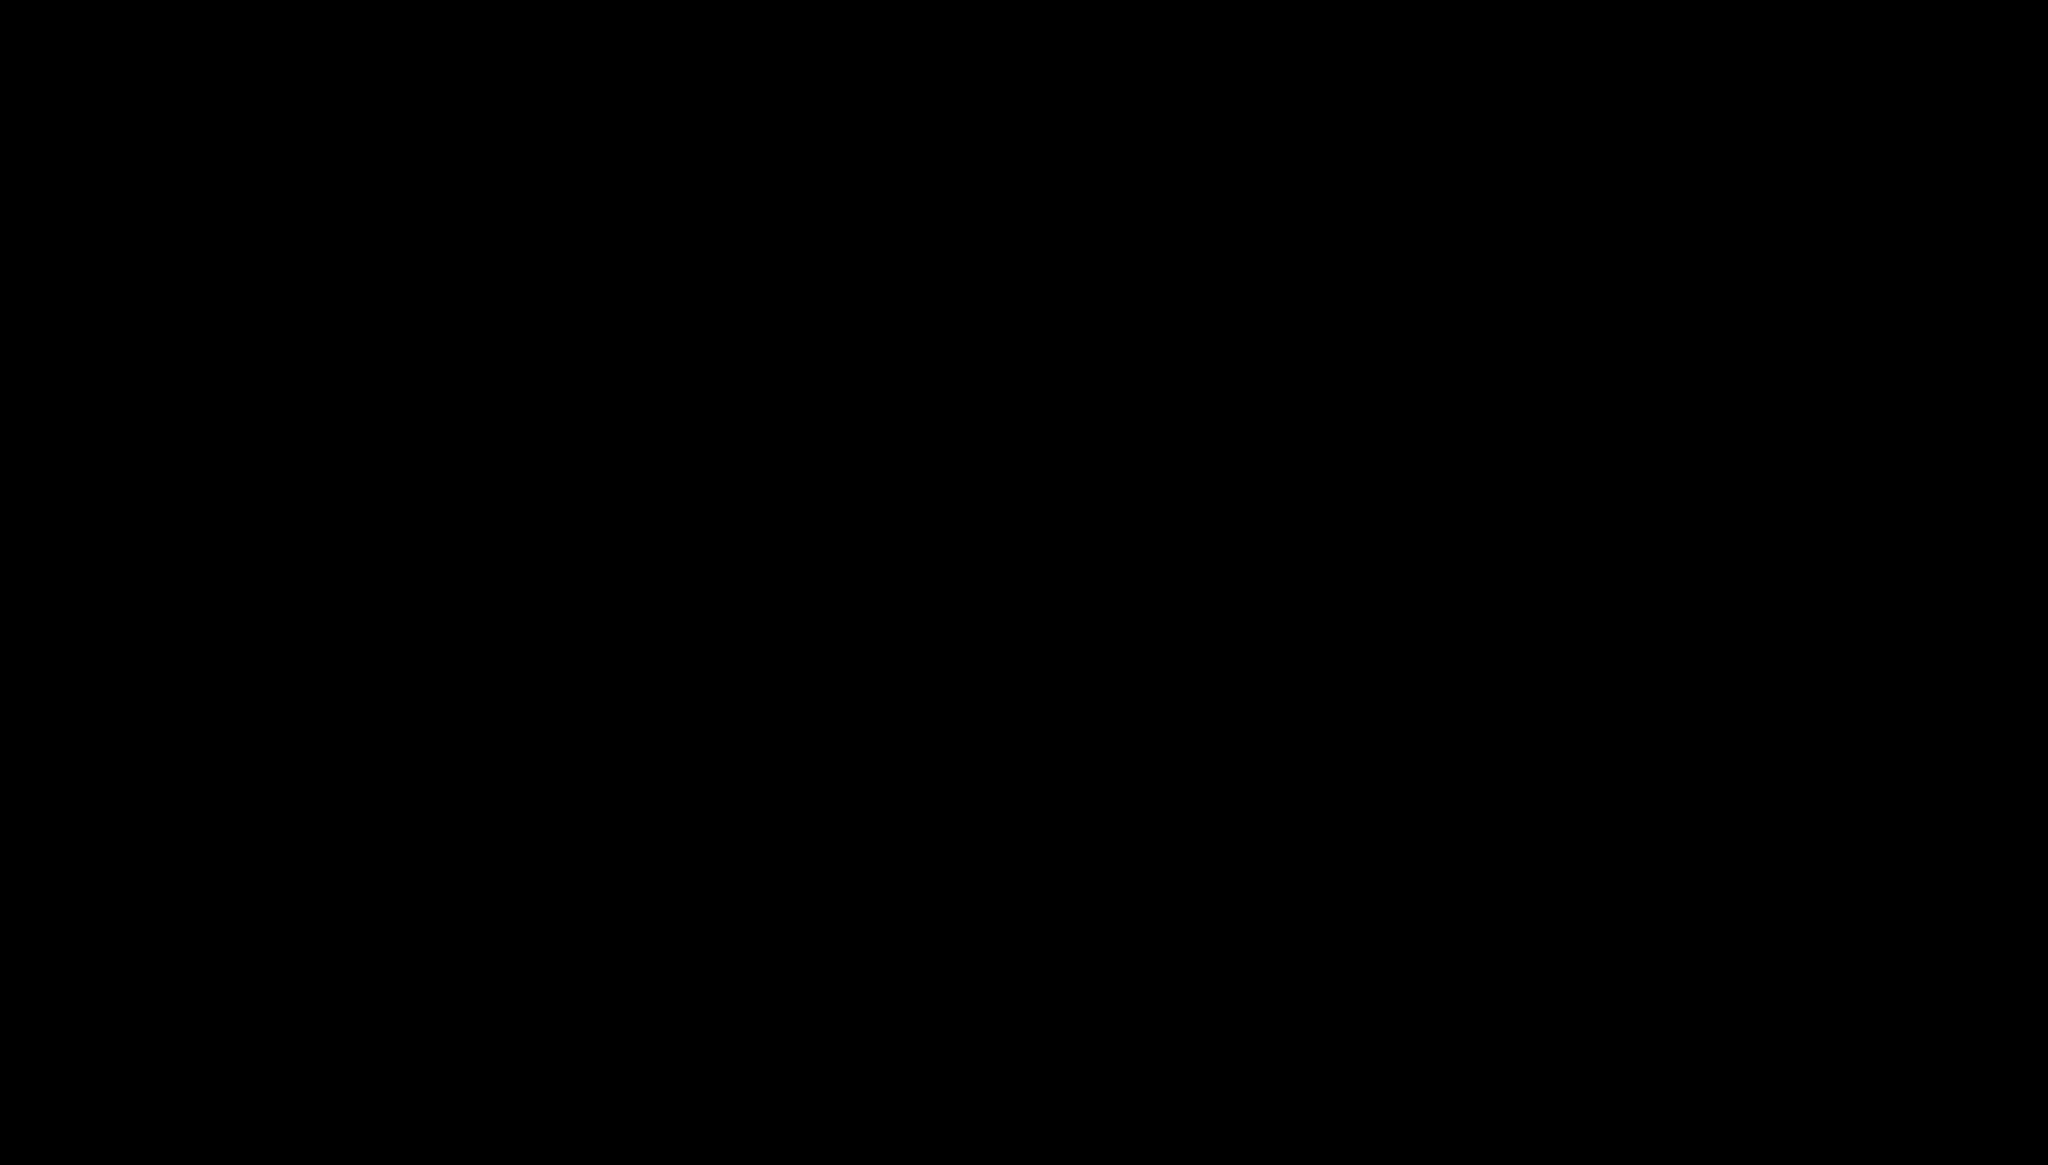 mg_4019